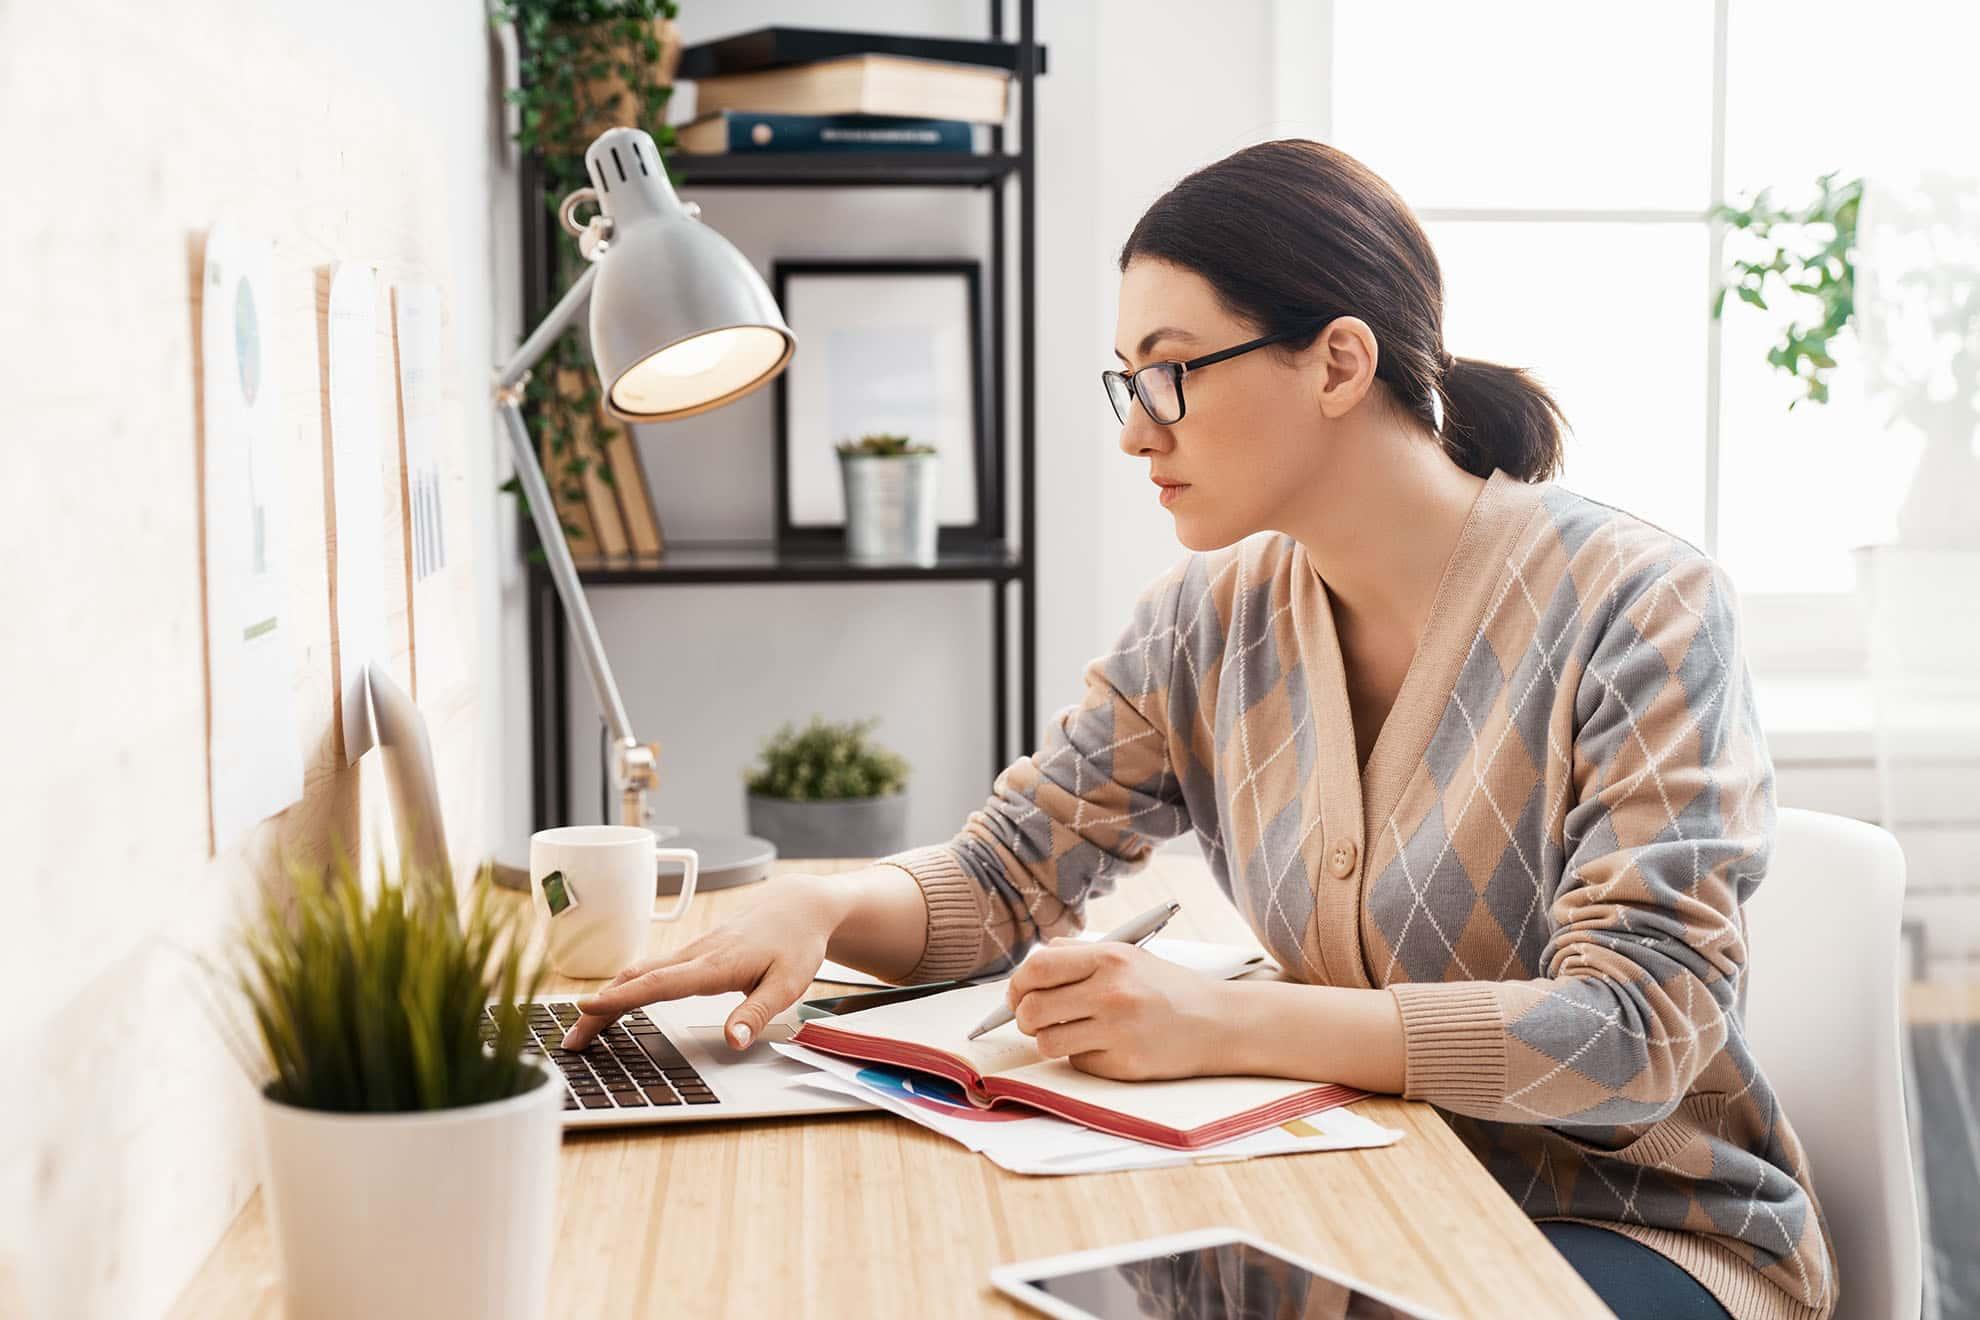 woman-working-on-a-laptop-at-home-KS5KFLT-min